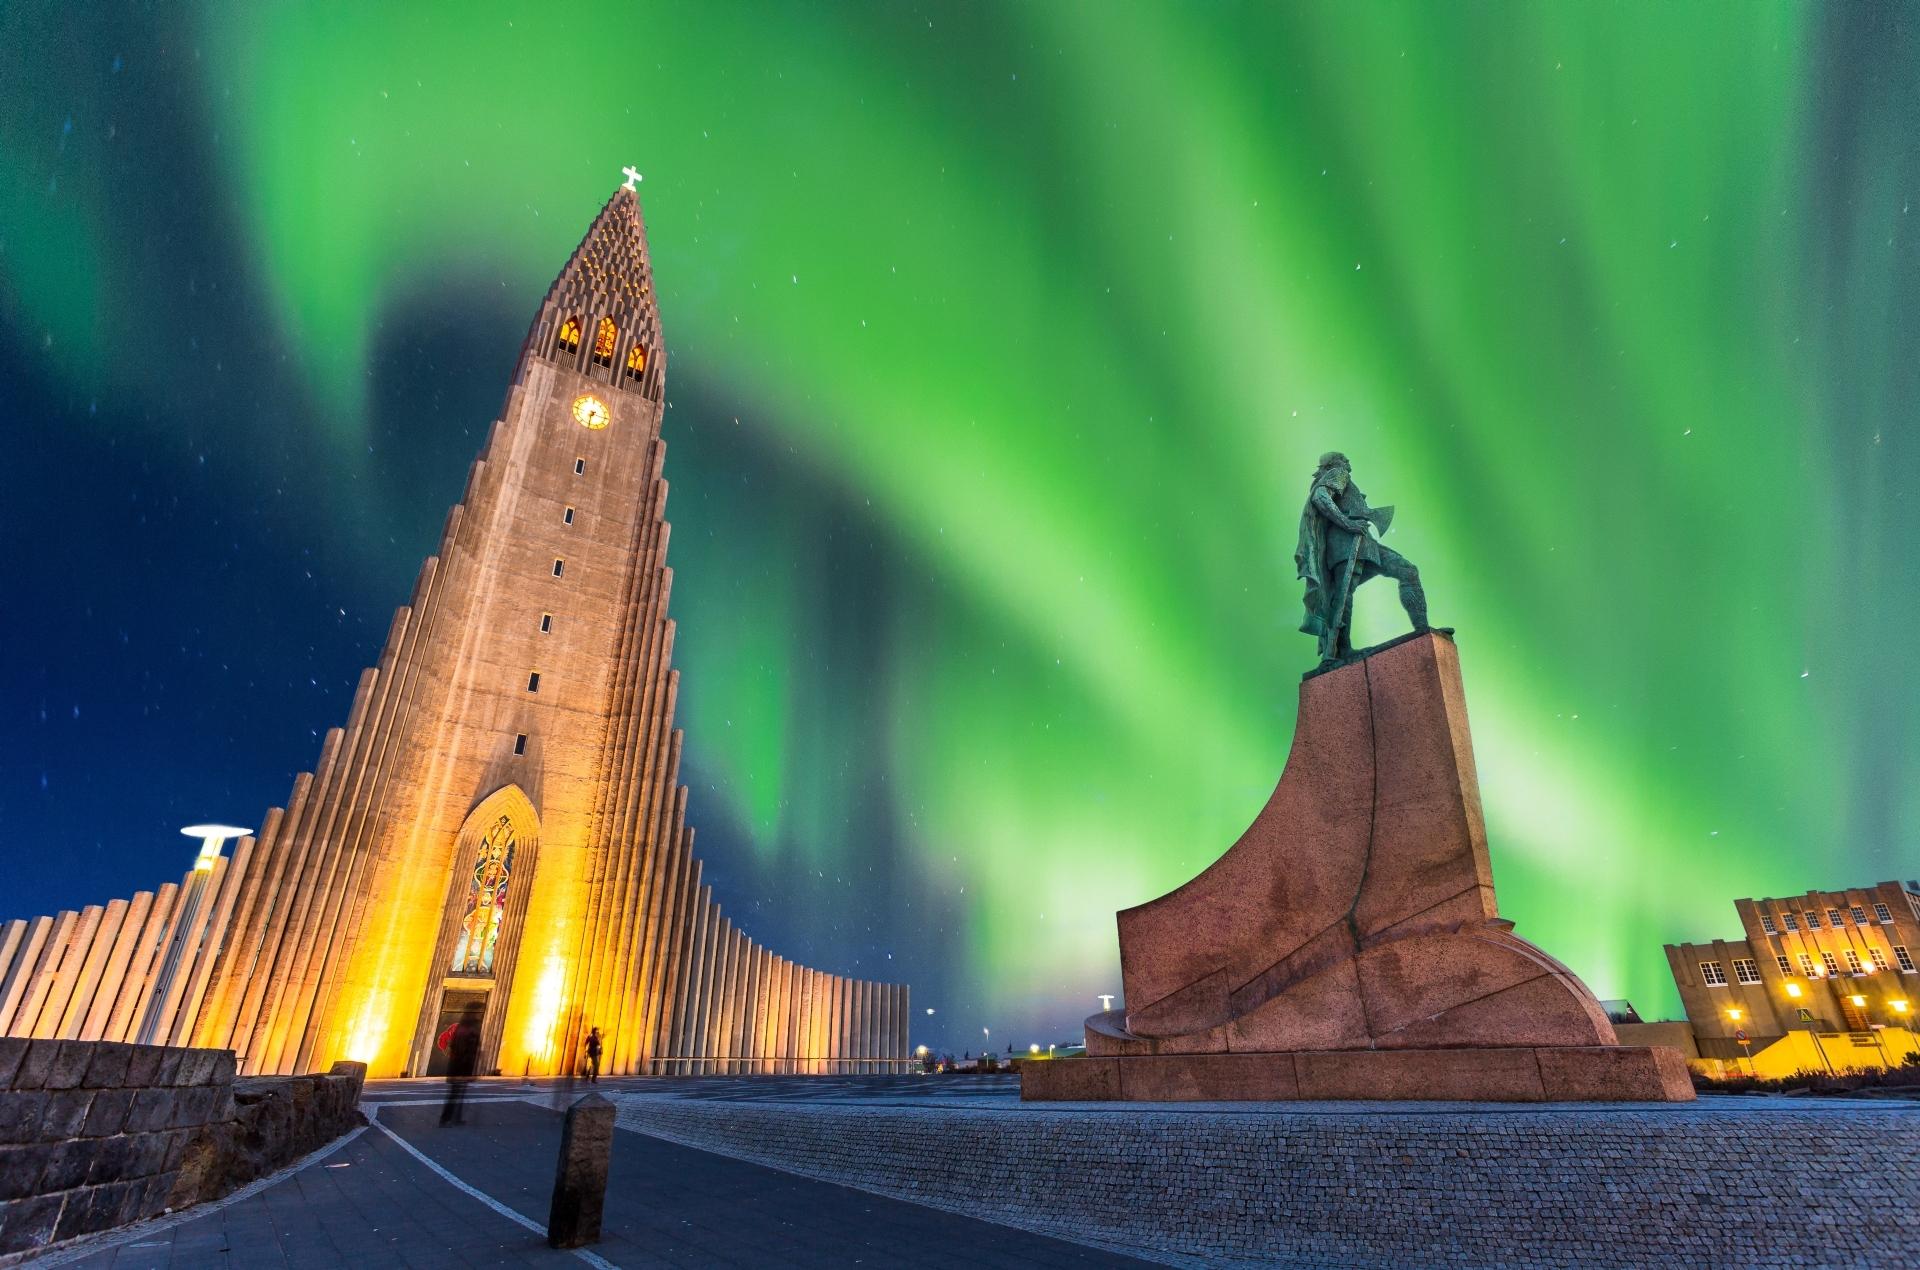 aurores boreales sur l'église hallgrimskirkja